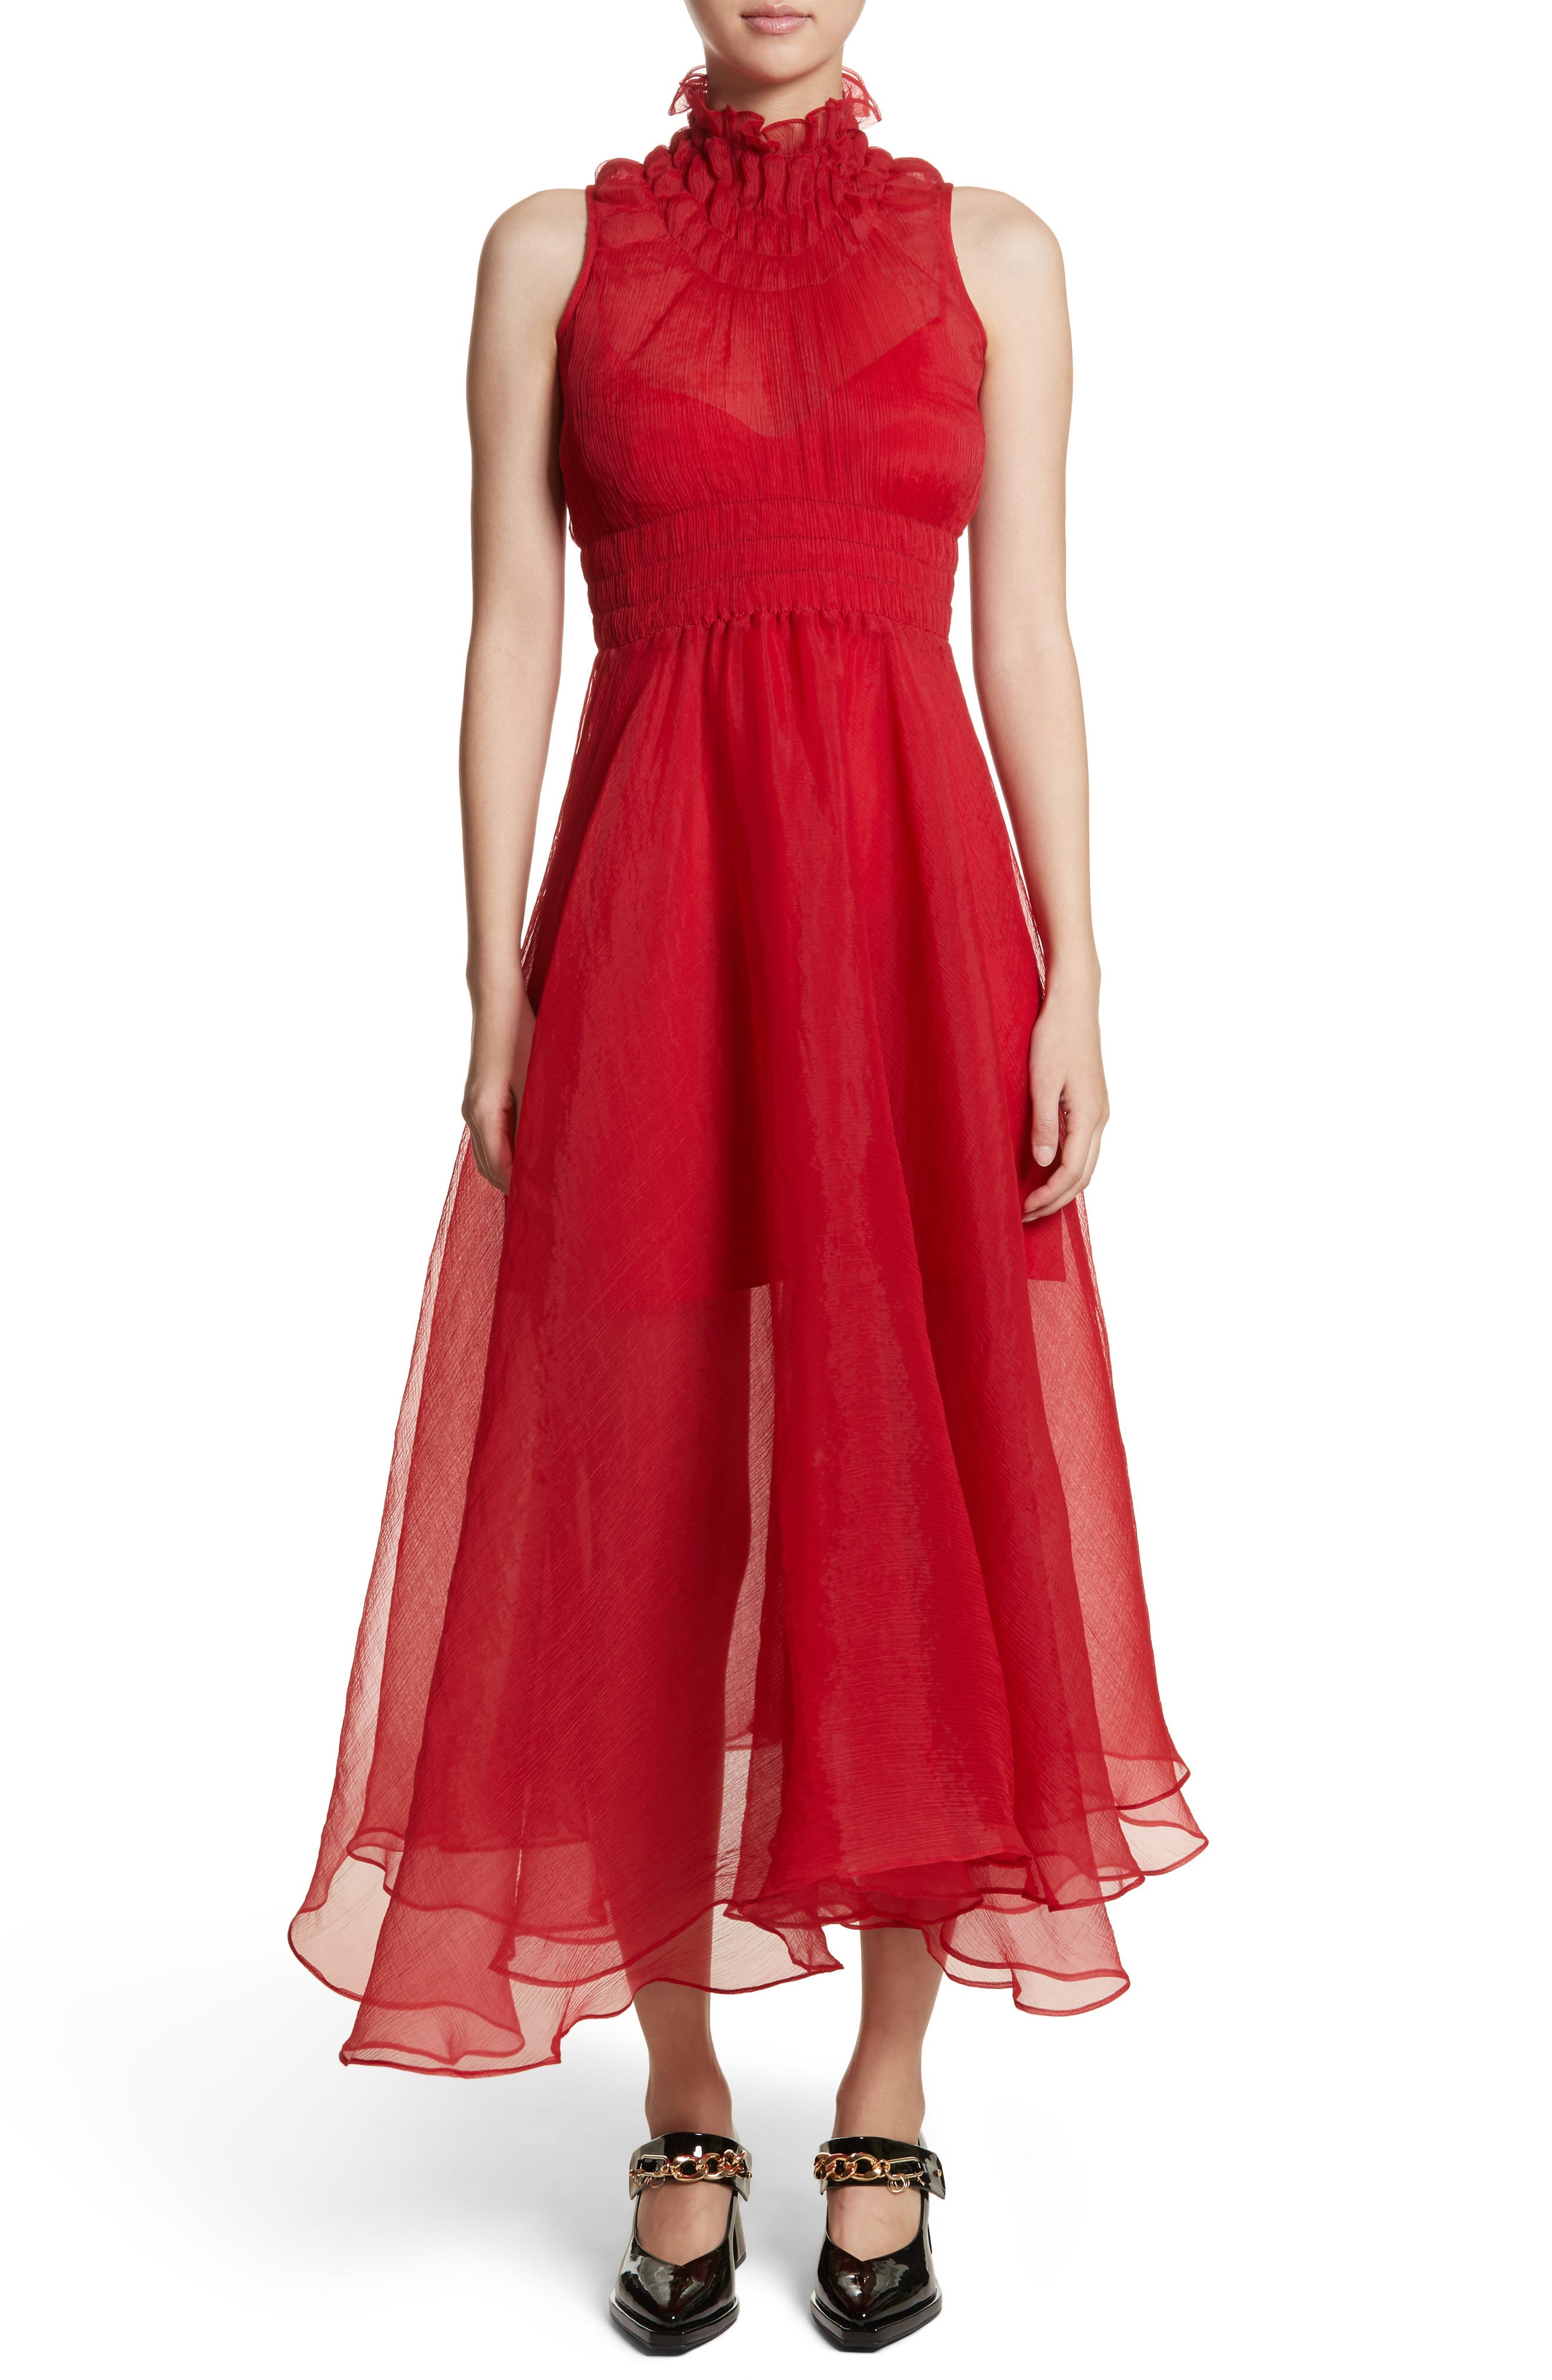 Venus Chiffon Dress,                             Main thumbnail 1, color,                             Red